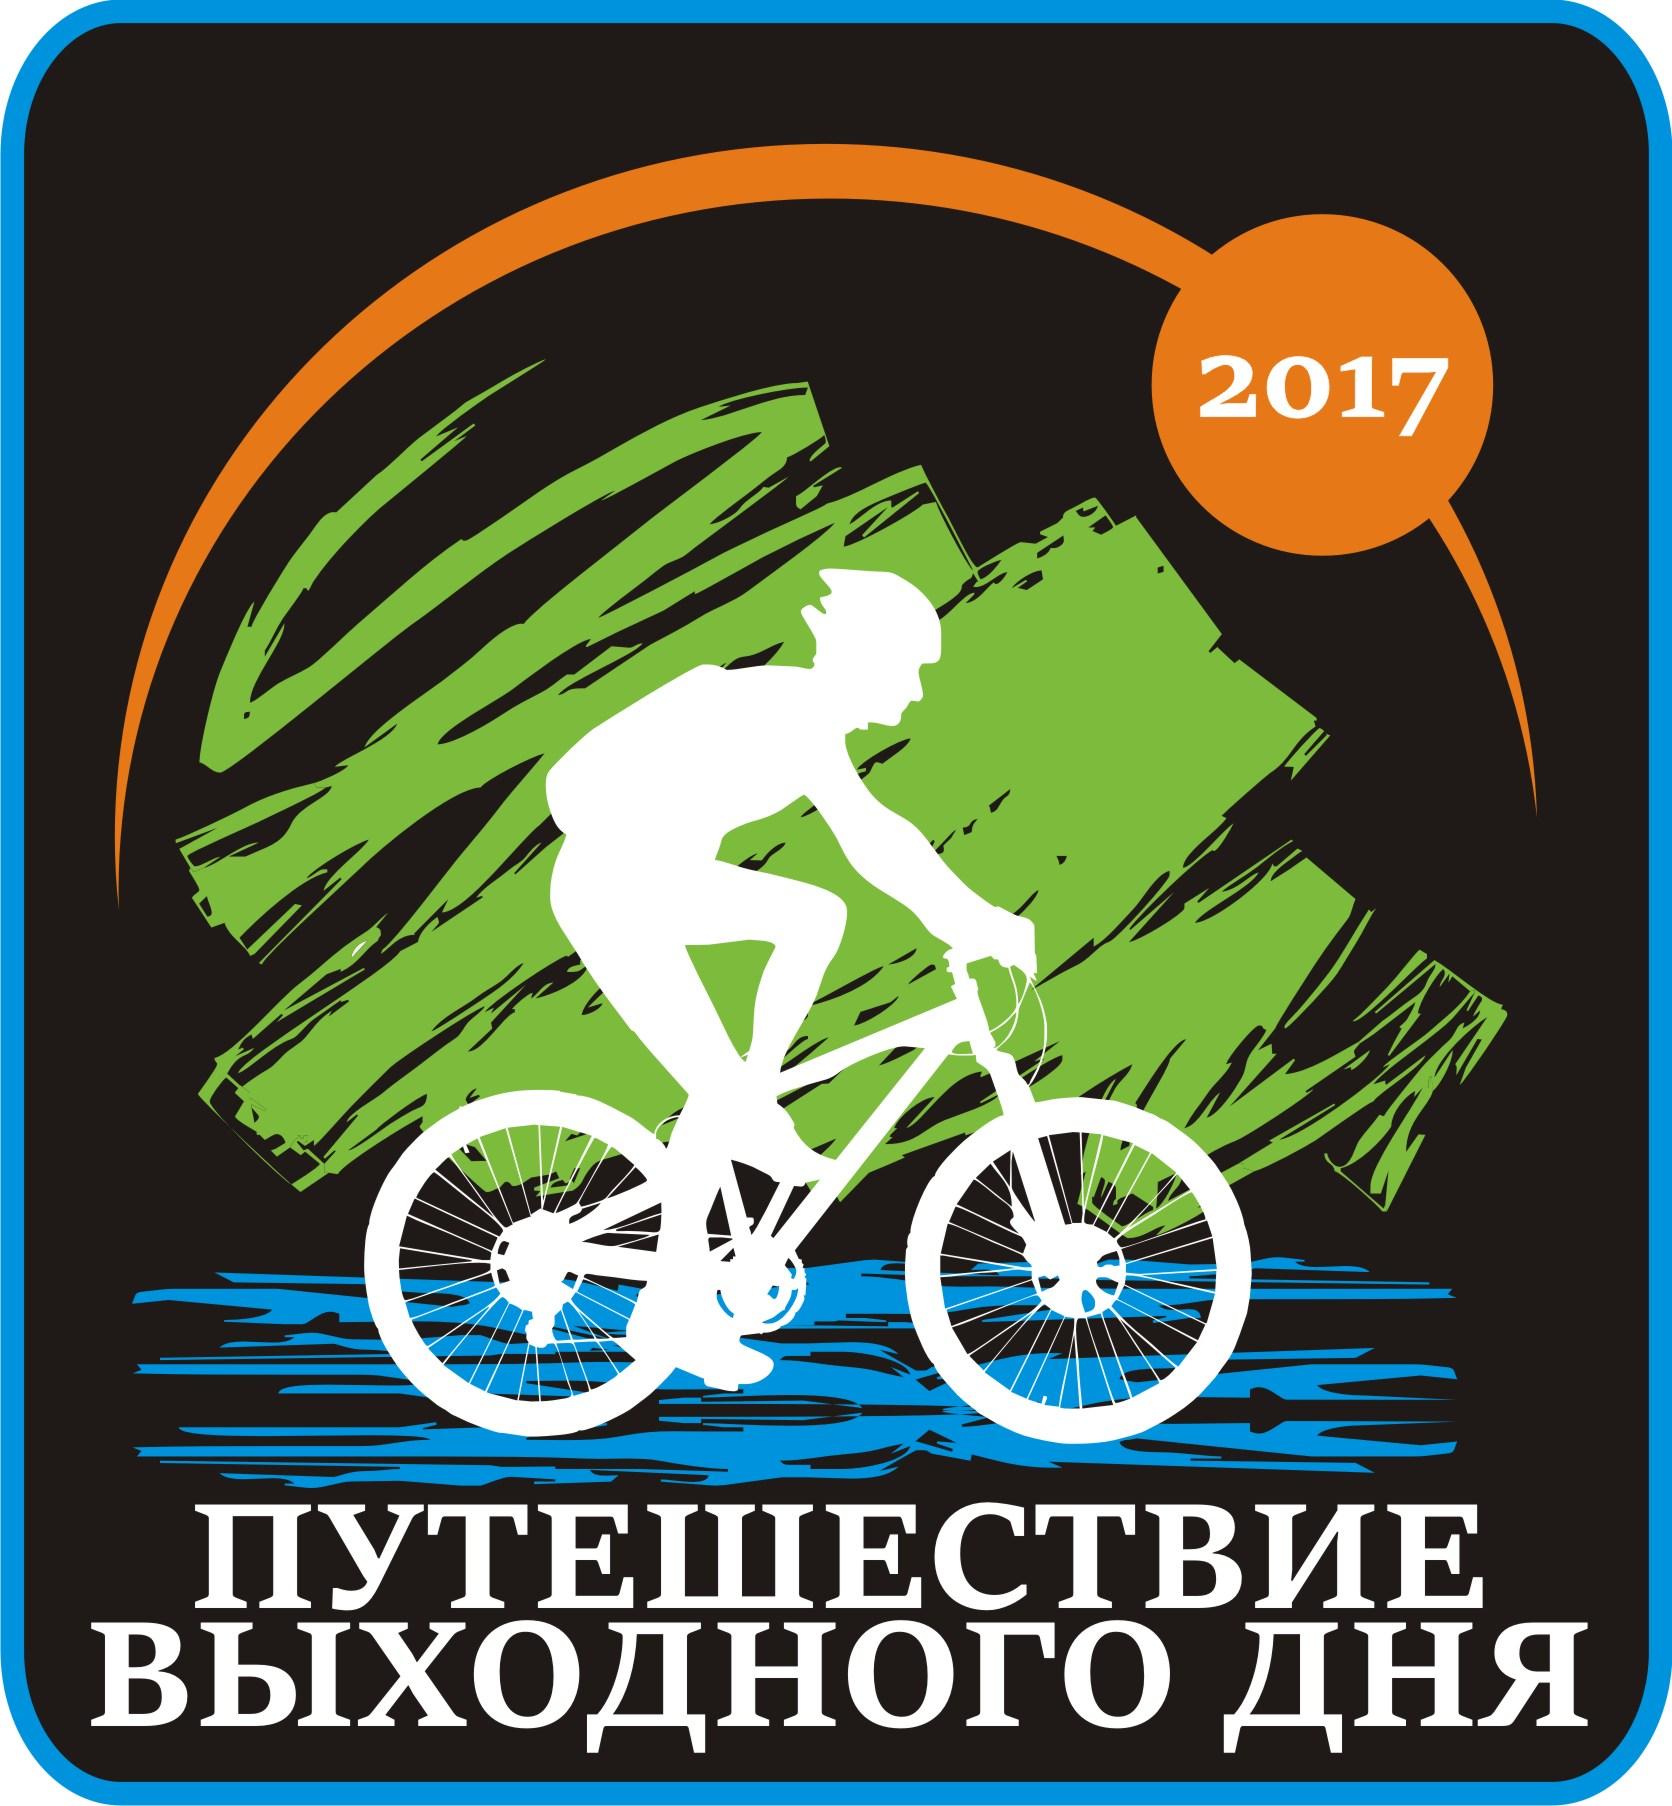 02bbe5fbfd04 Соревнования 2017   СпортМир Экипцентр